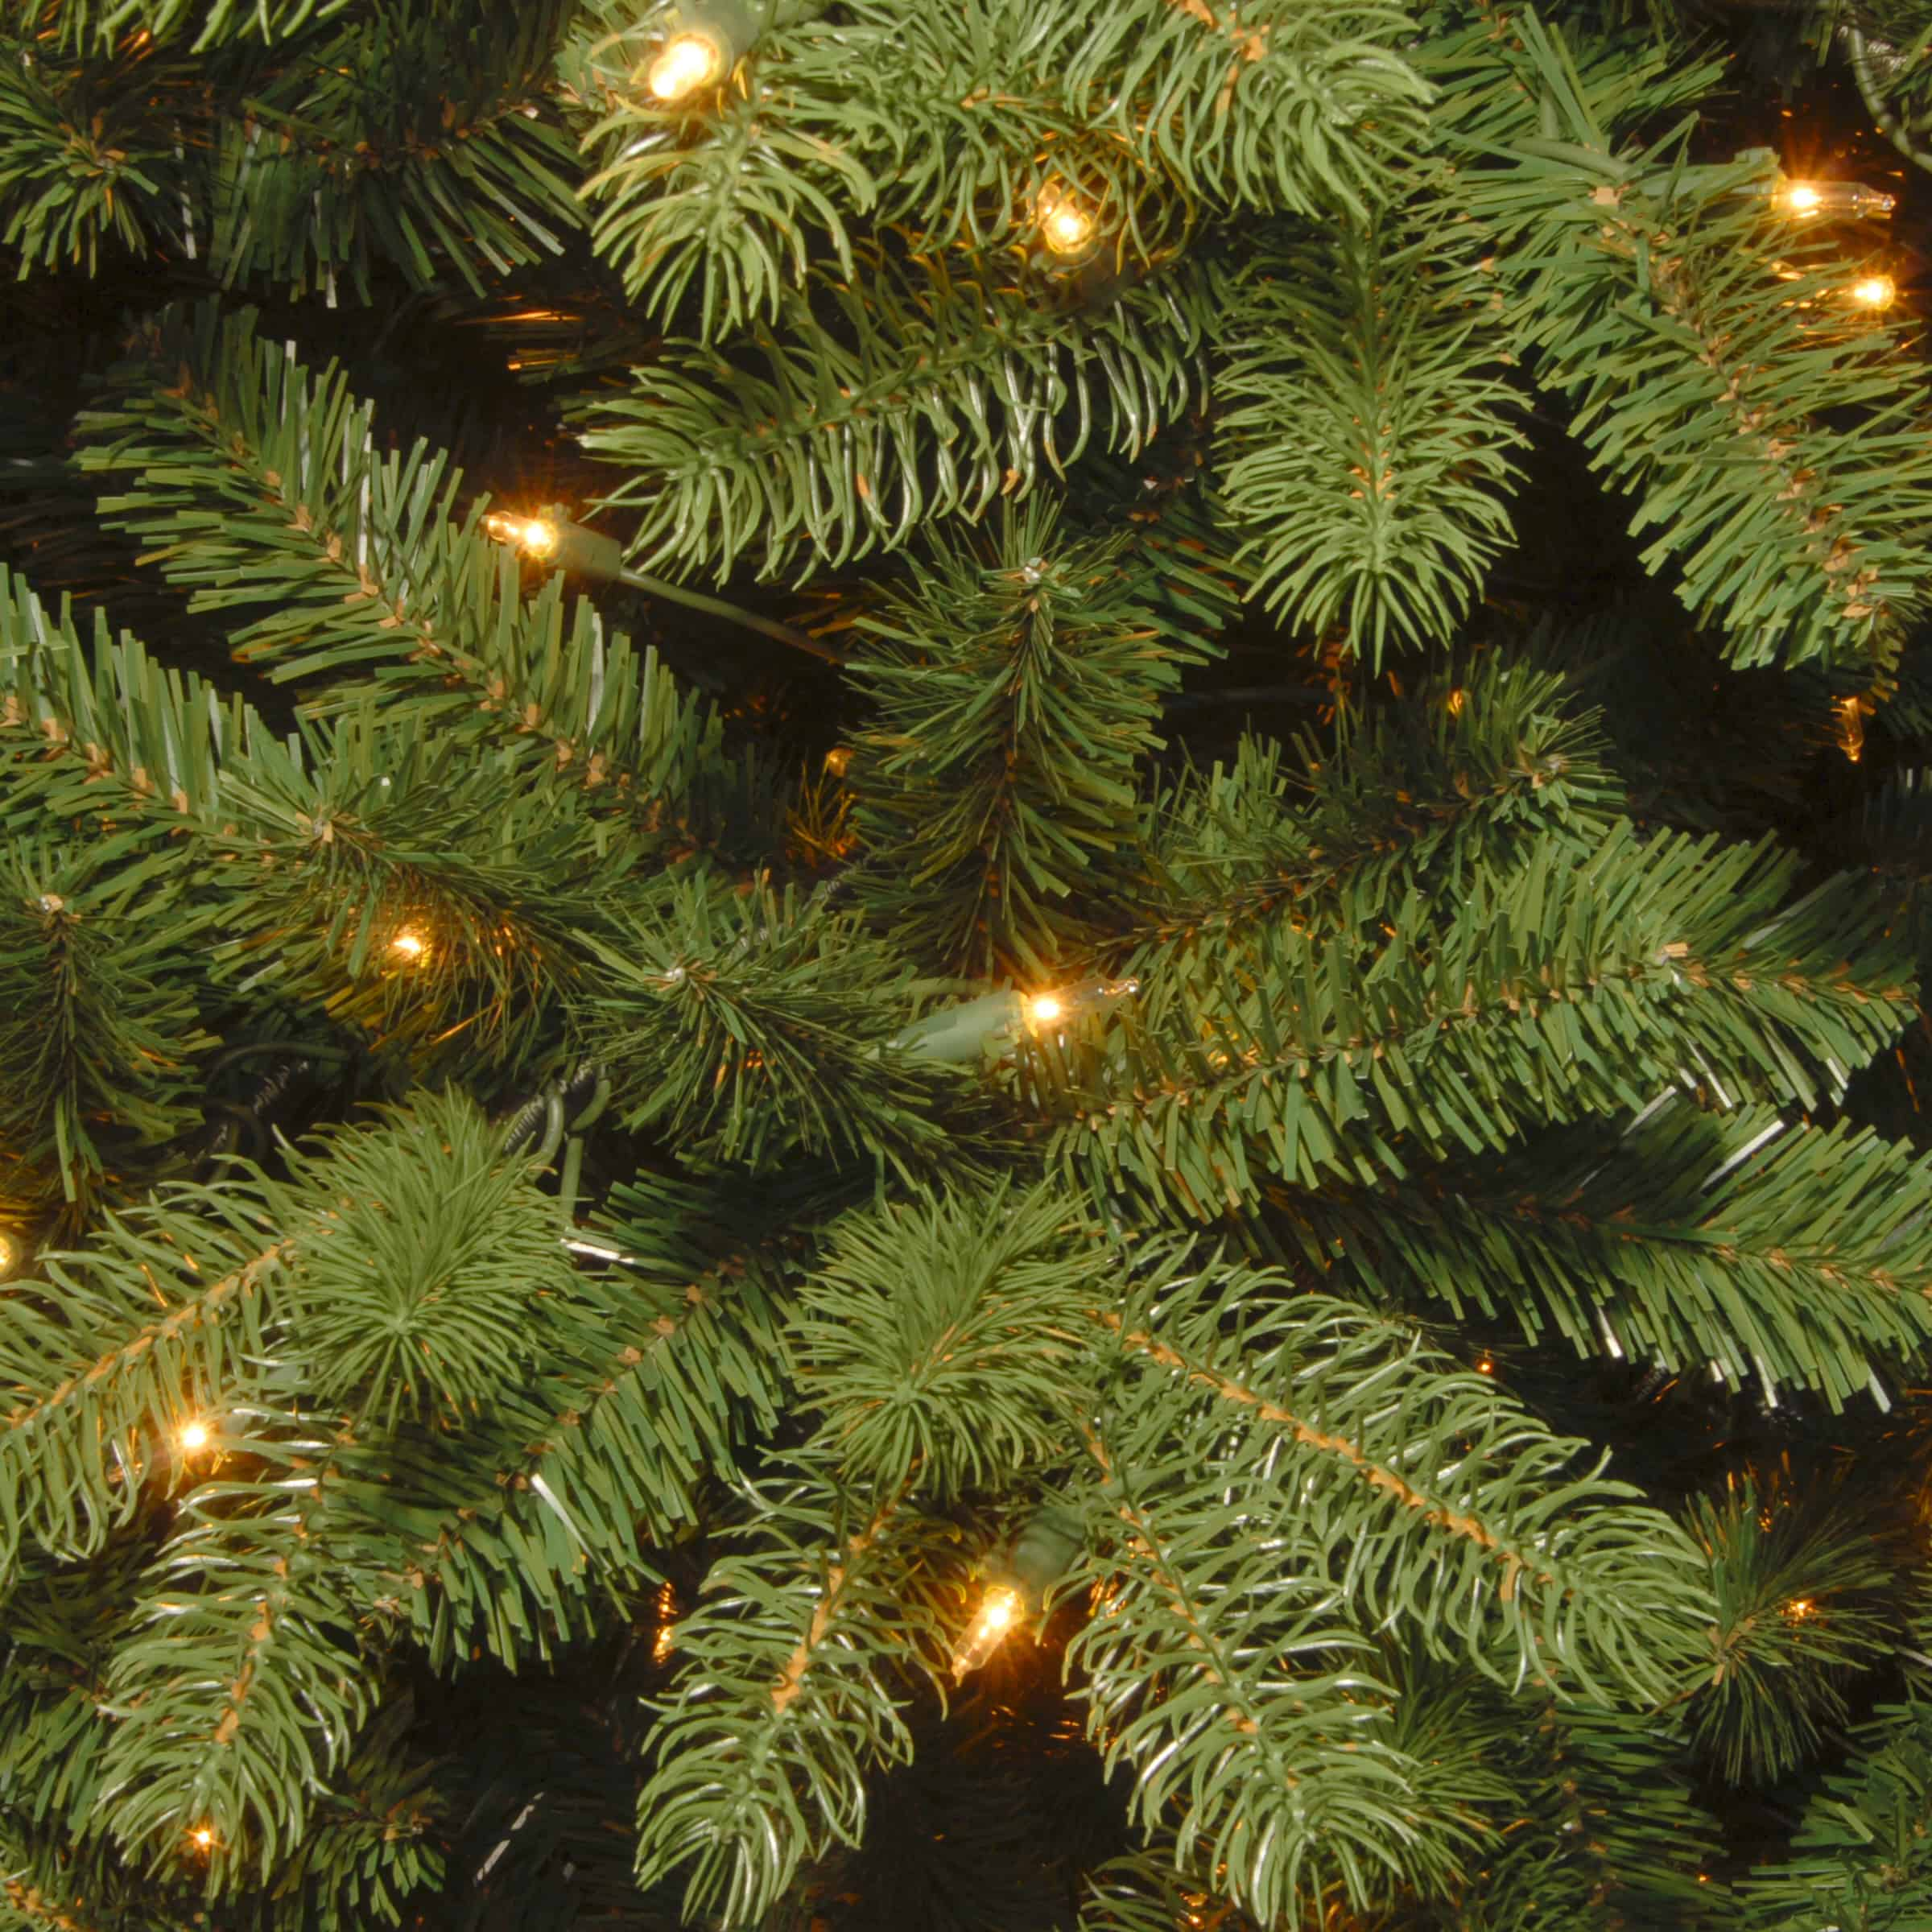 Pre-Lit Artificial Christmas Trees